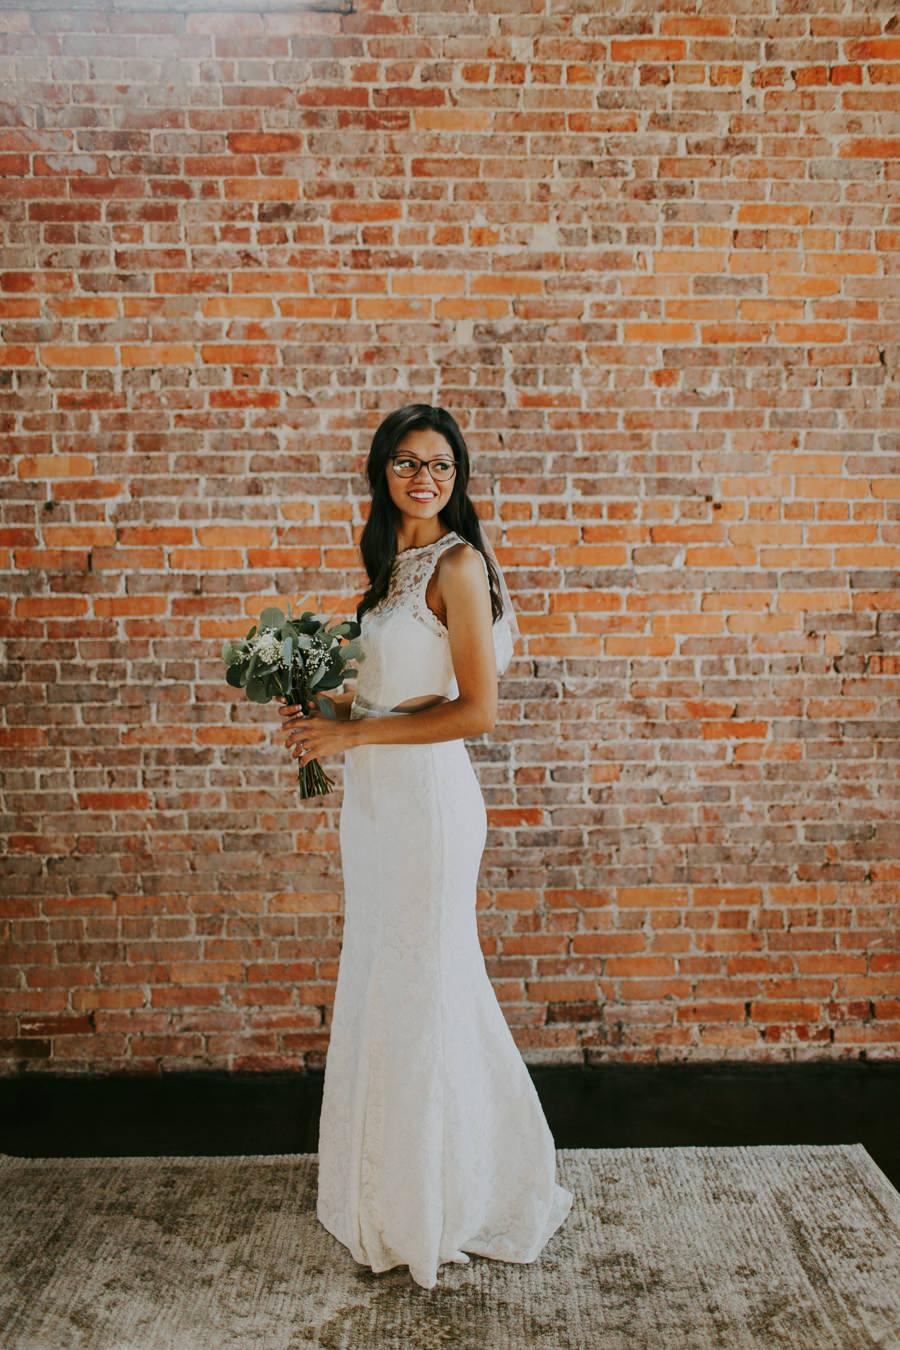 Tampa Heights Industrial Wedding at Cavu Emmy RJ-33.jpg